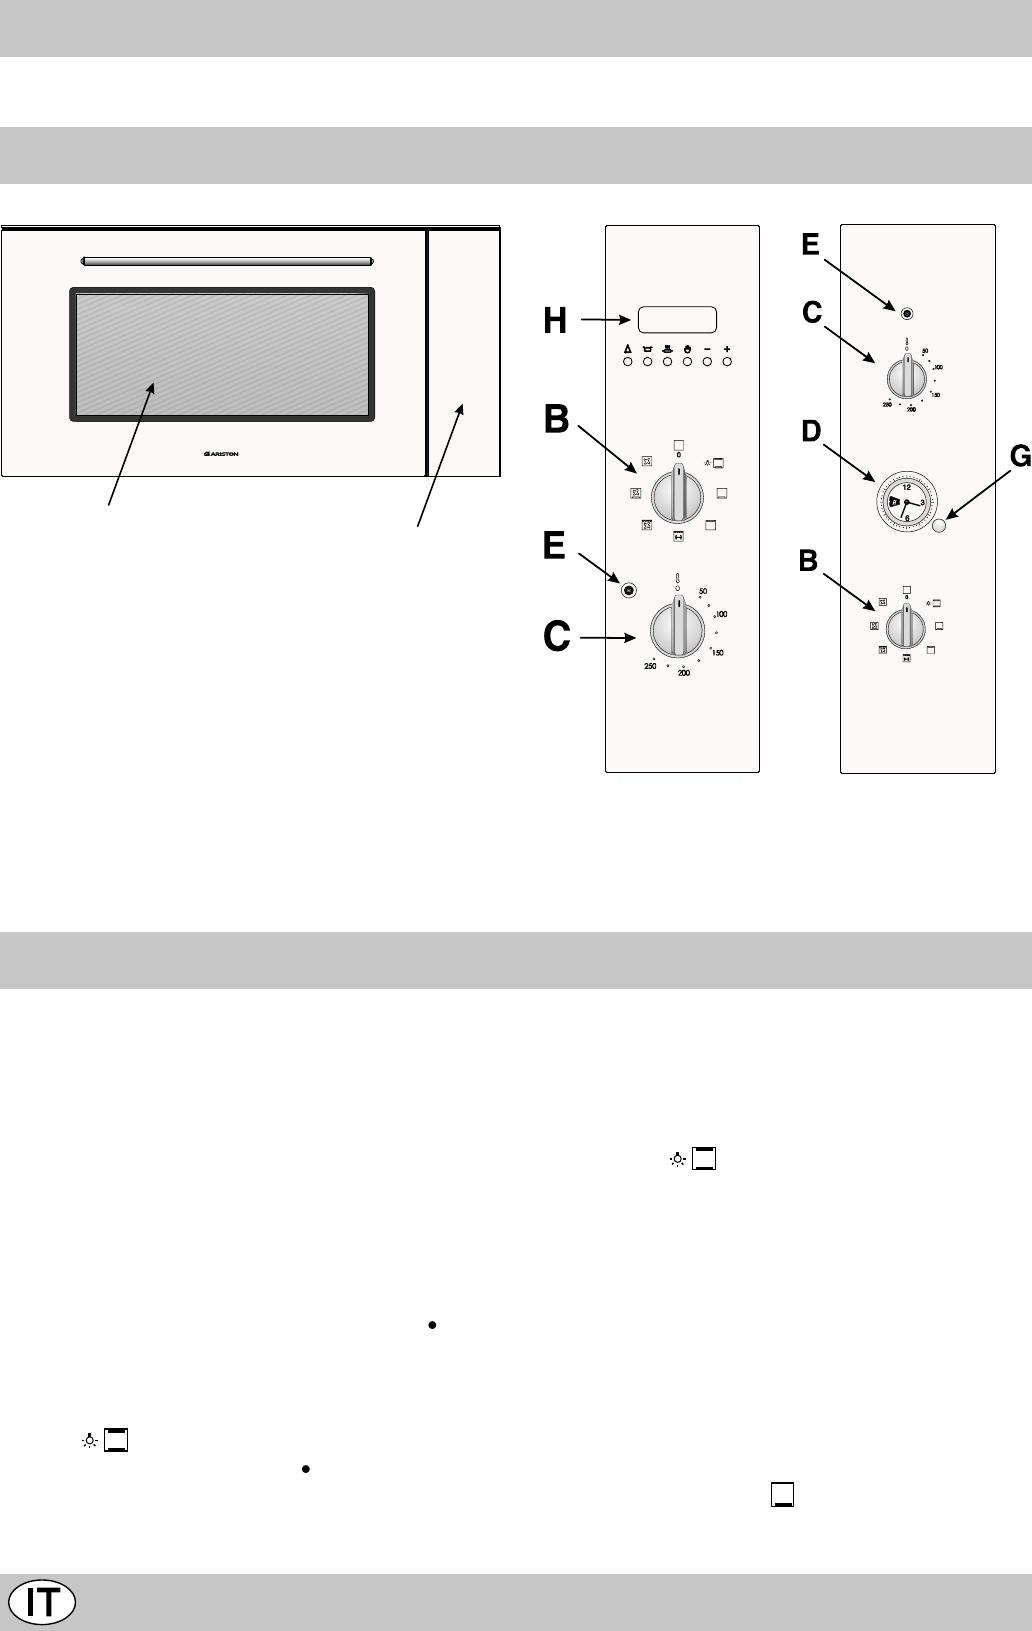 Handleiding Ariston Xf 995 3 Pagina 3 Van 60 Deutsch